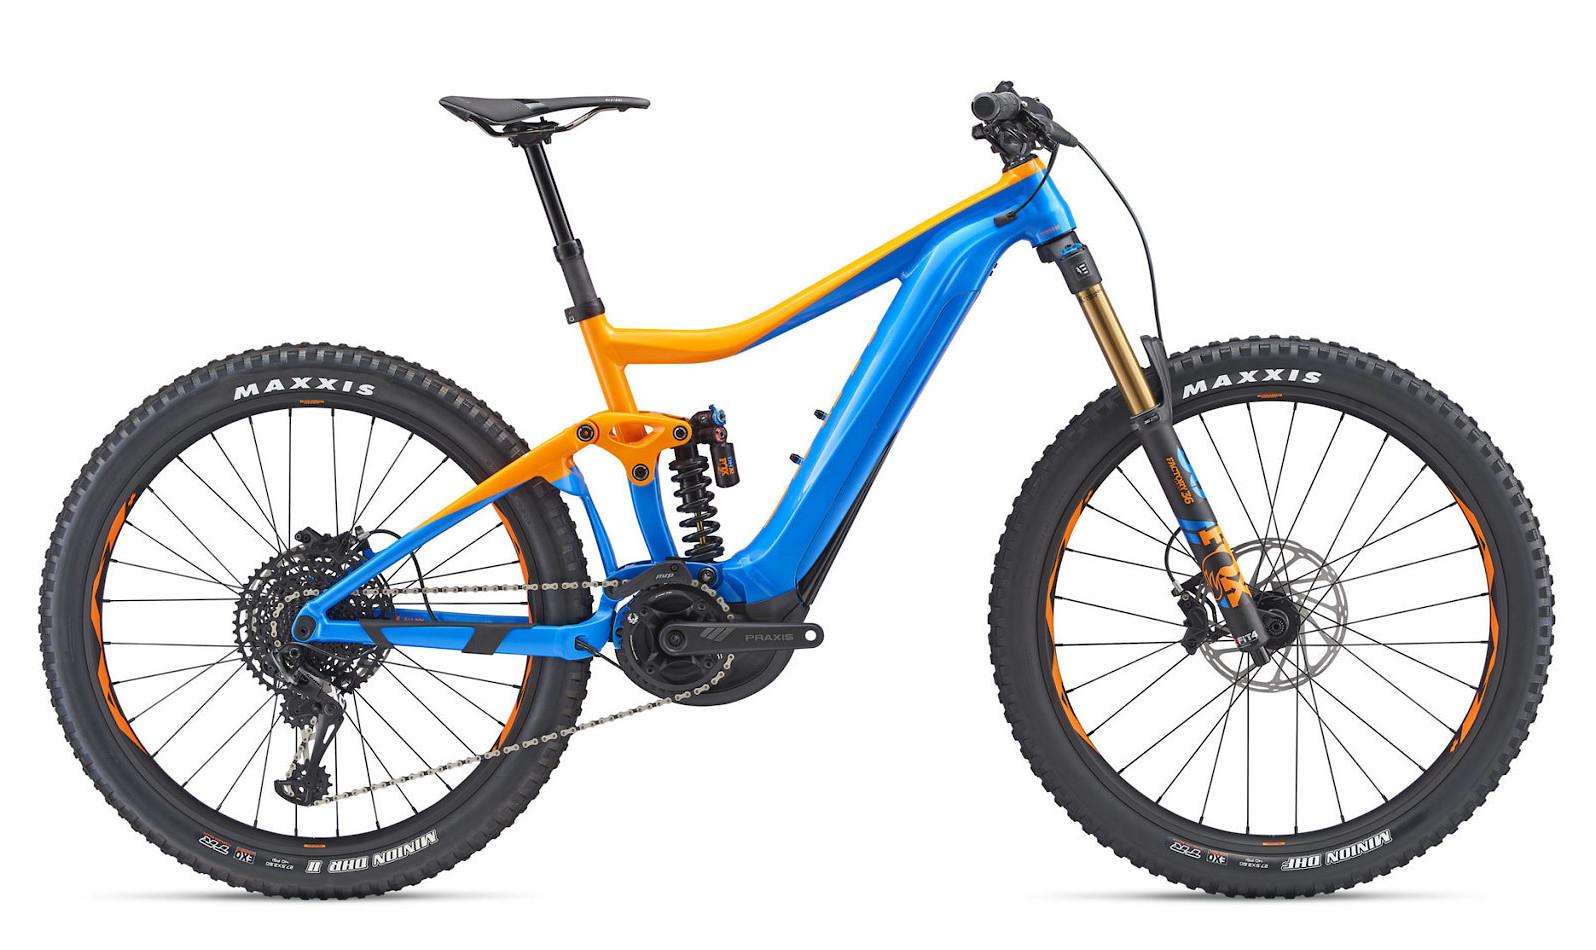 2019 Giant Trance SX E+ 0 Pro E-Bike